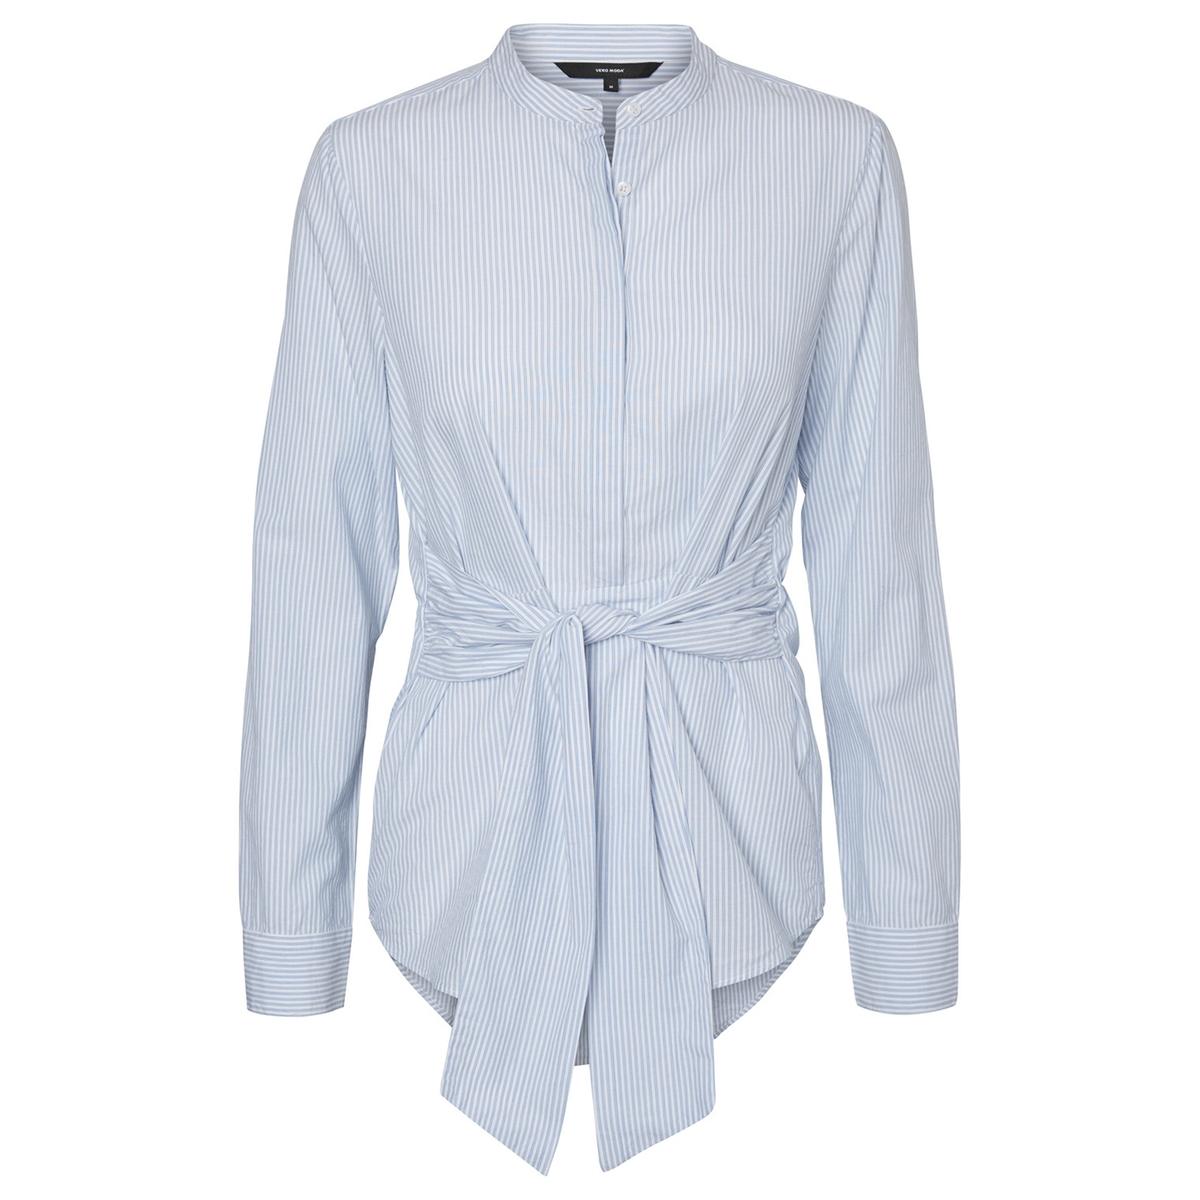 Блузка VERO MODA 5105409 от LaRedoute